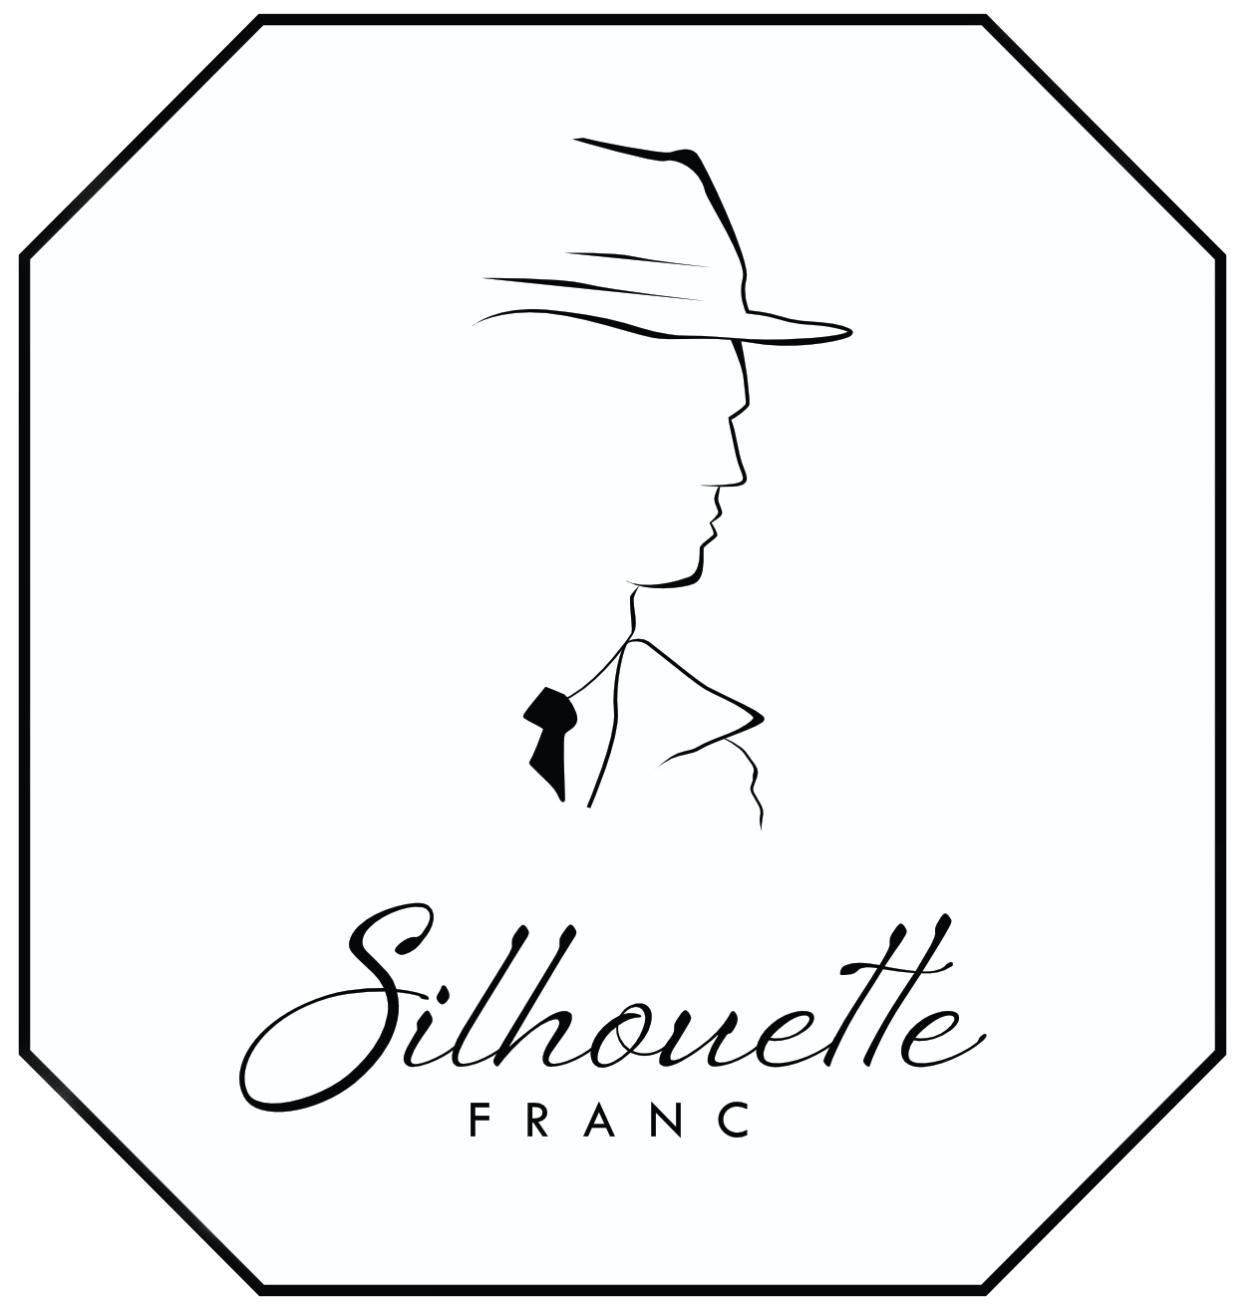 2010 Silhouette Franc